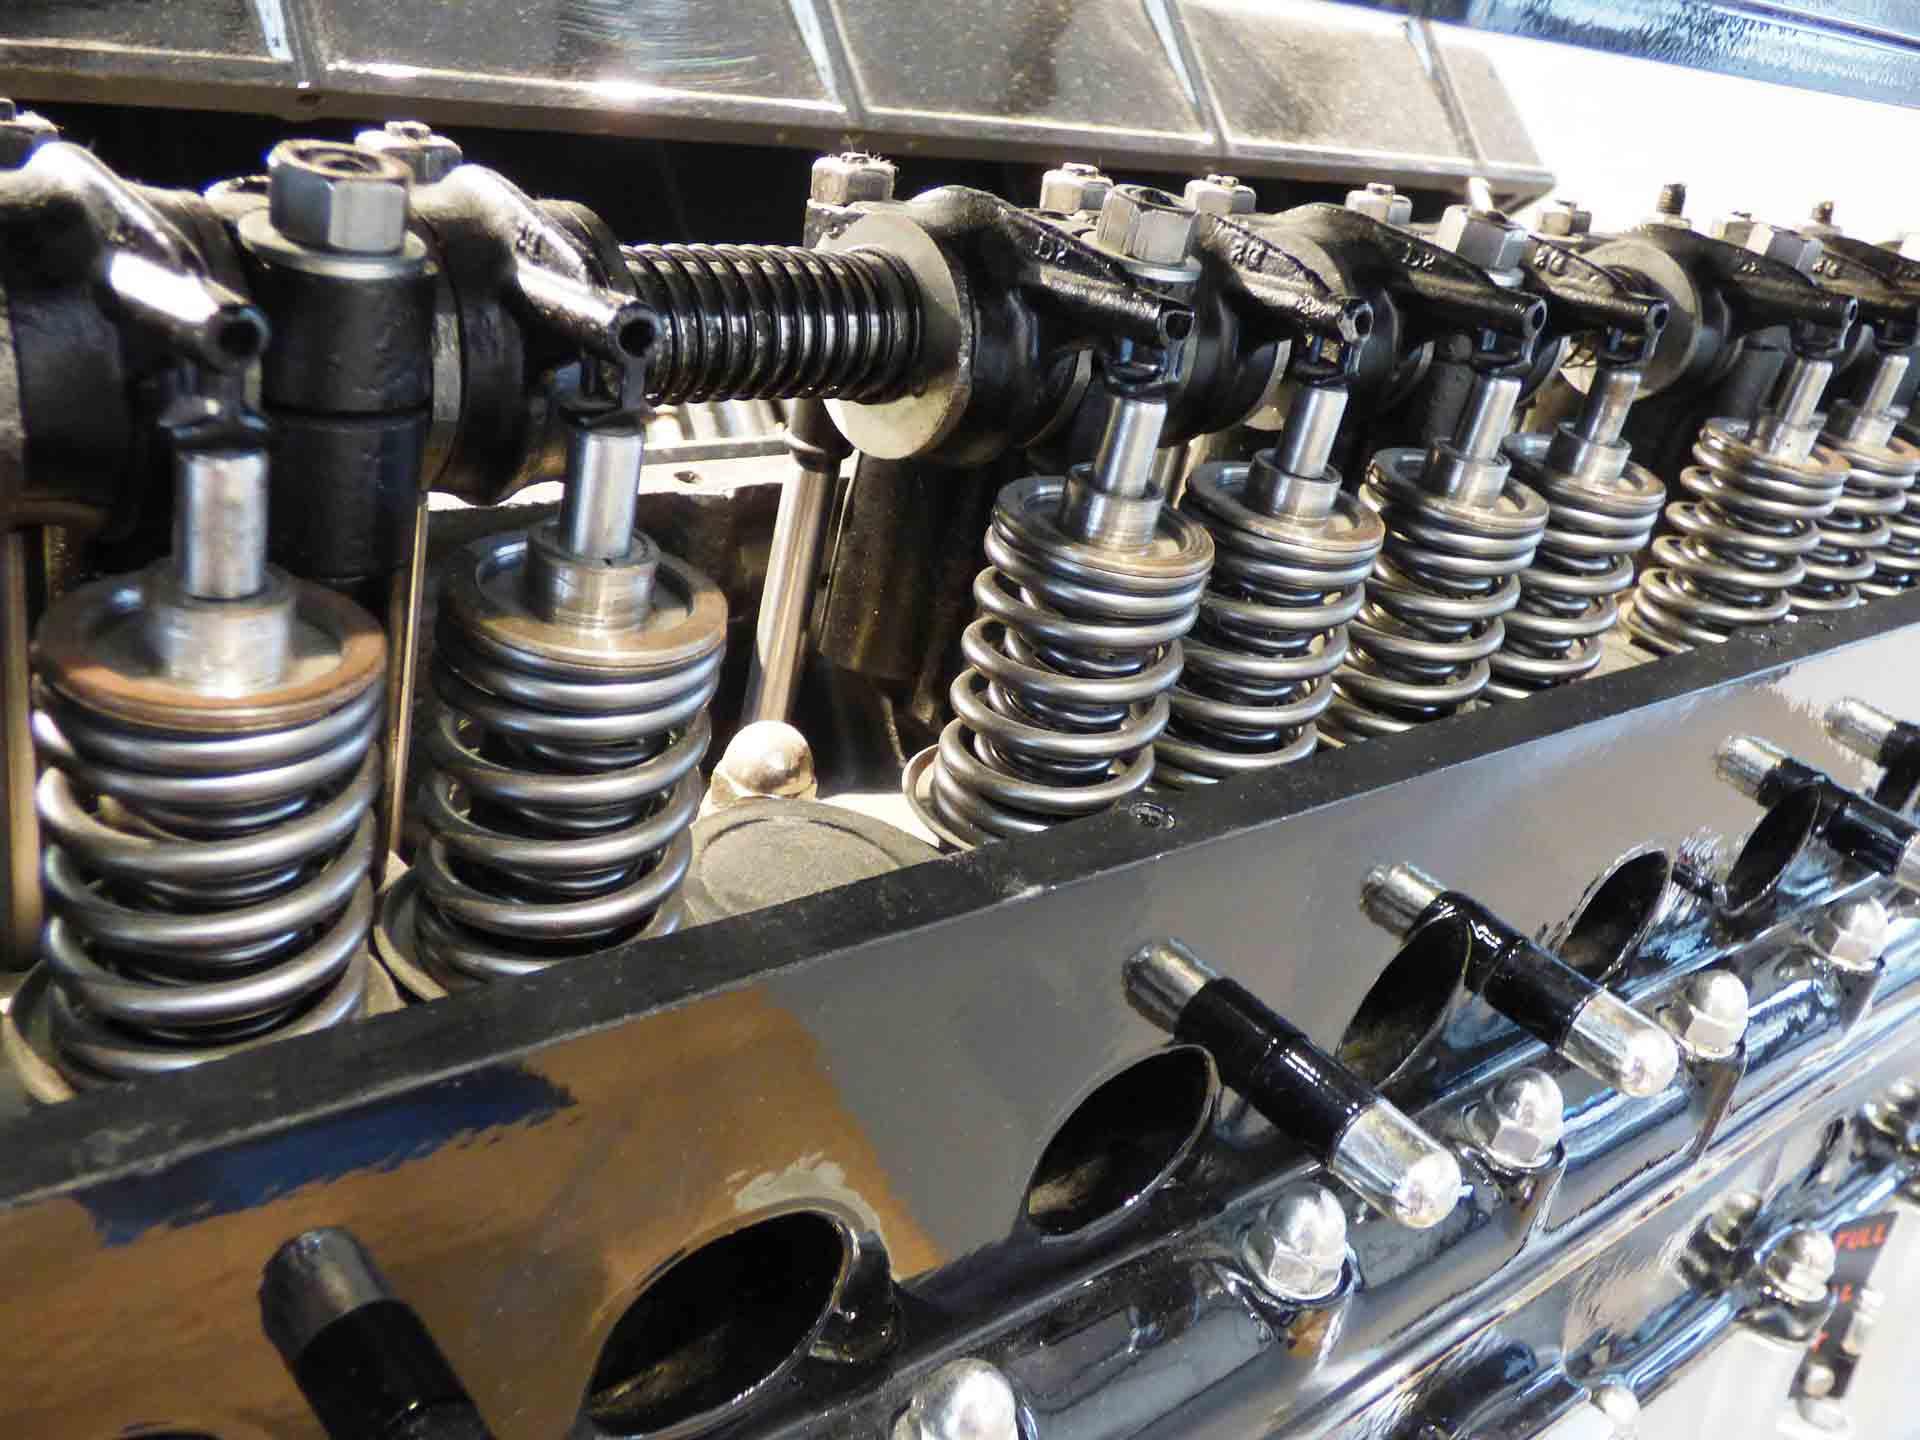 Mega Power Engine Sludge Remover. Gets it clean. Keeps it clean!